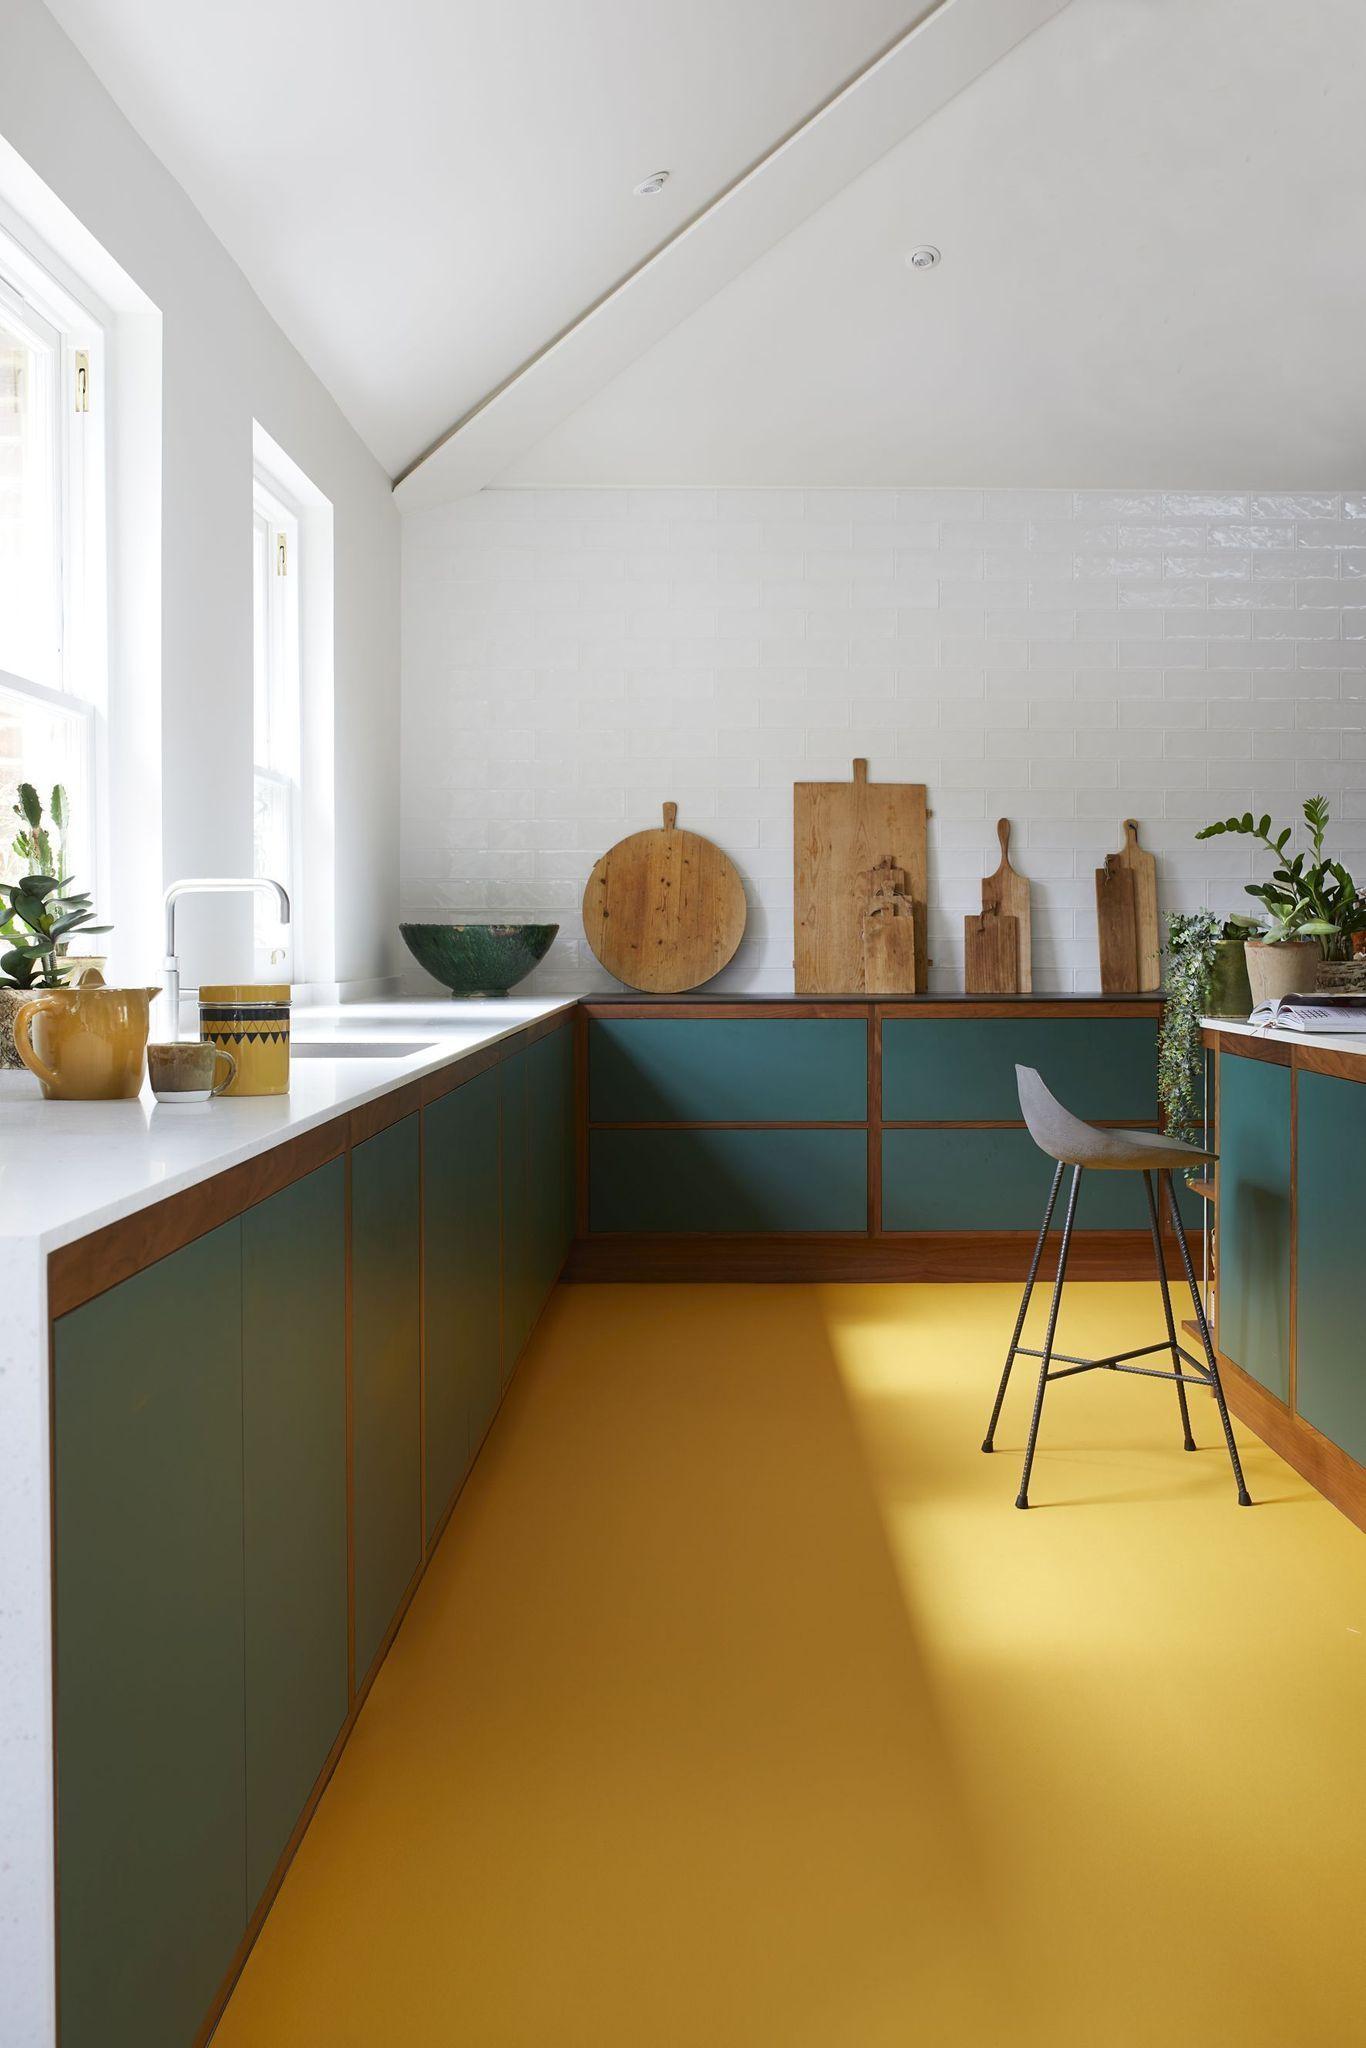 Yellow Kitchen Floorfloor kitchen yellow in 2020 ...